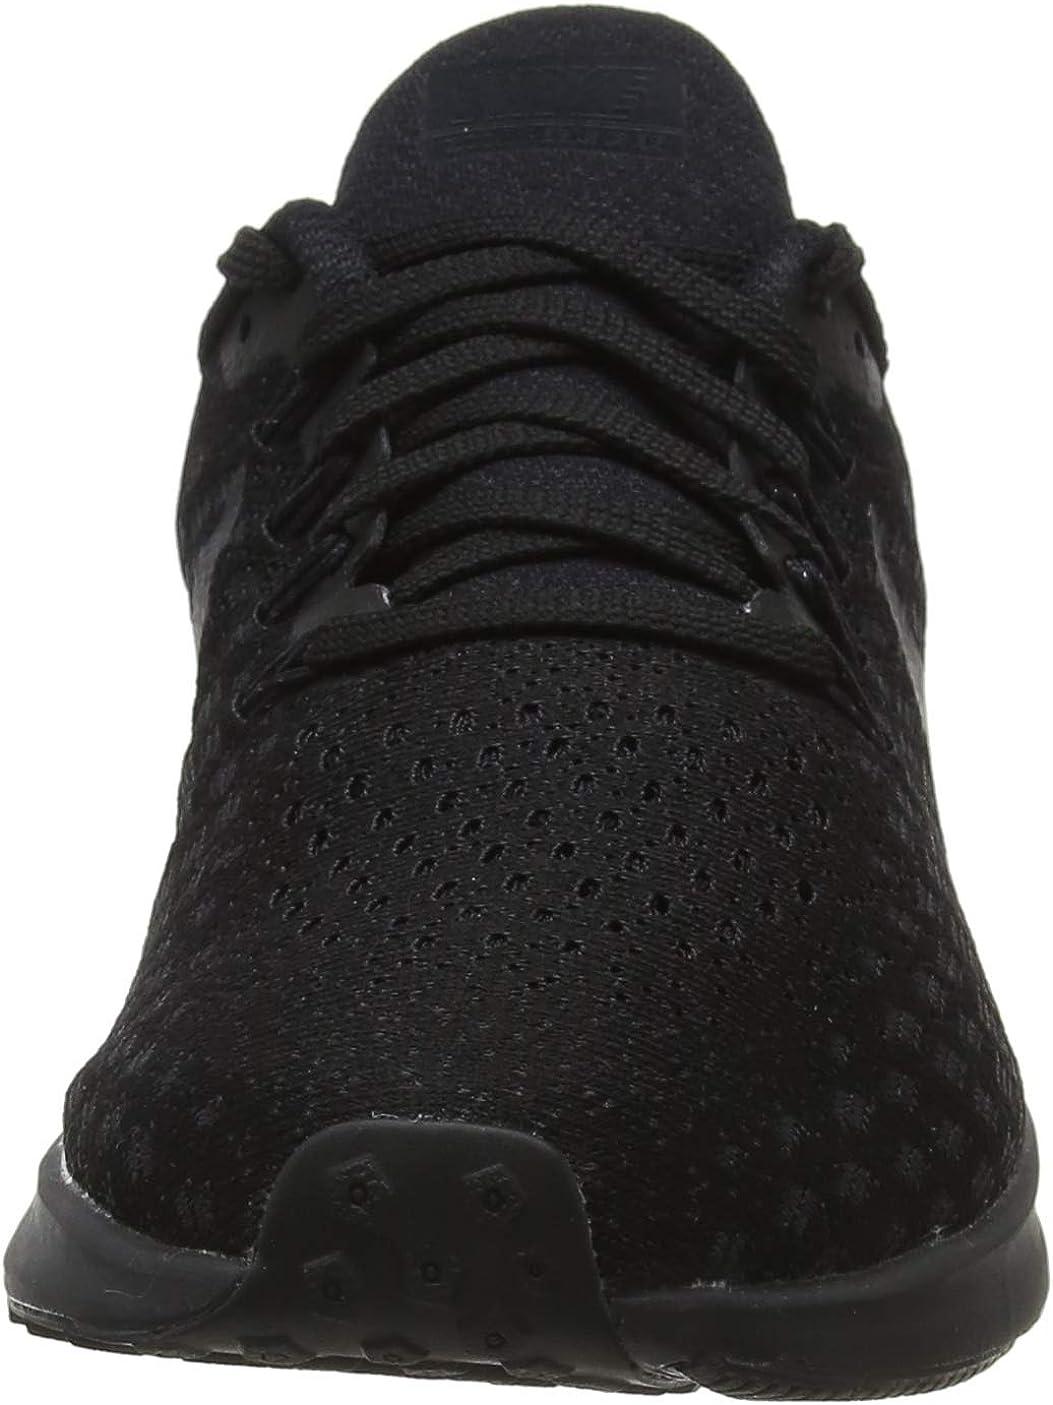 Nike Damen WMNS Air Zoom Pegasus 35 Laufschuhe, Schwarz/Weiß, 37.5 EU Mehrfarbig Black Oil Grey White 002